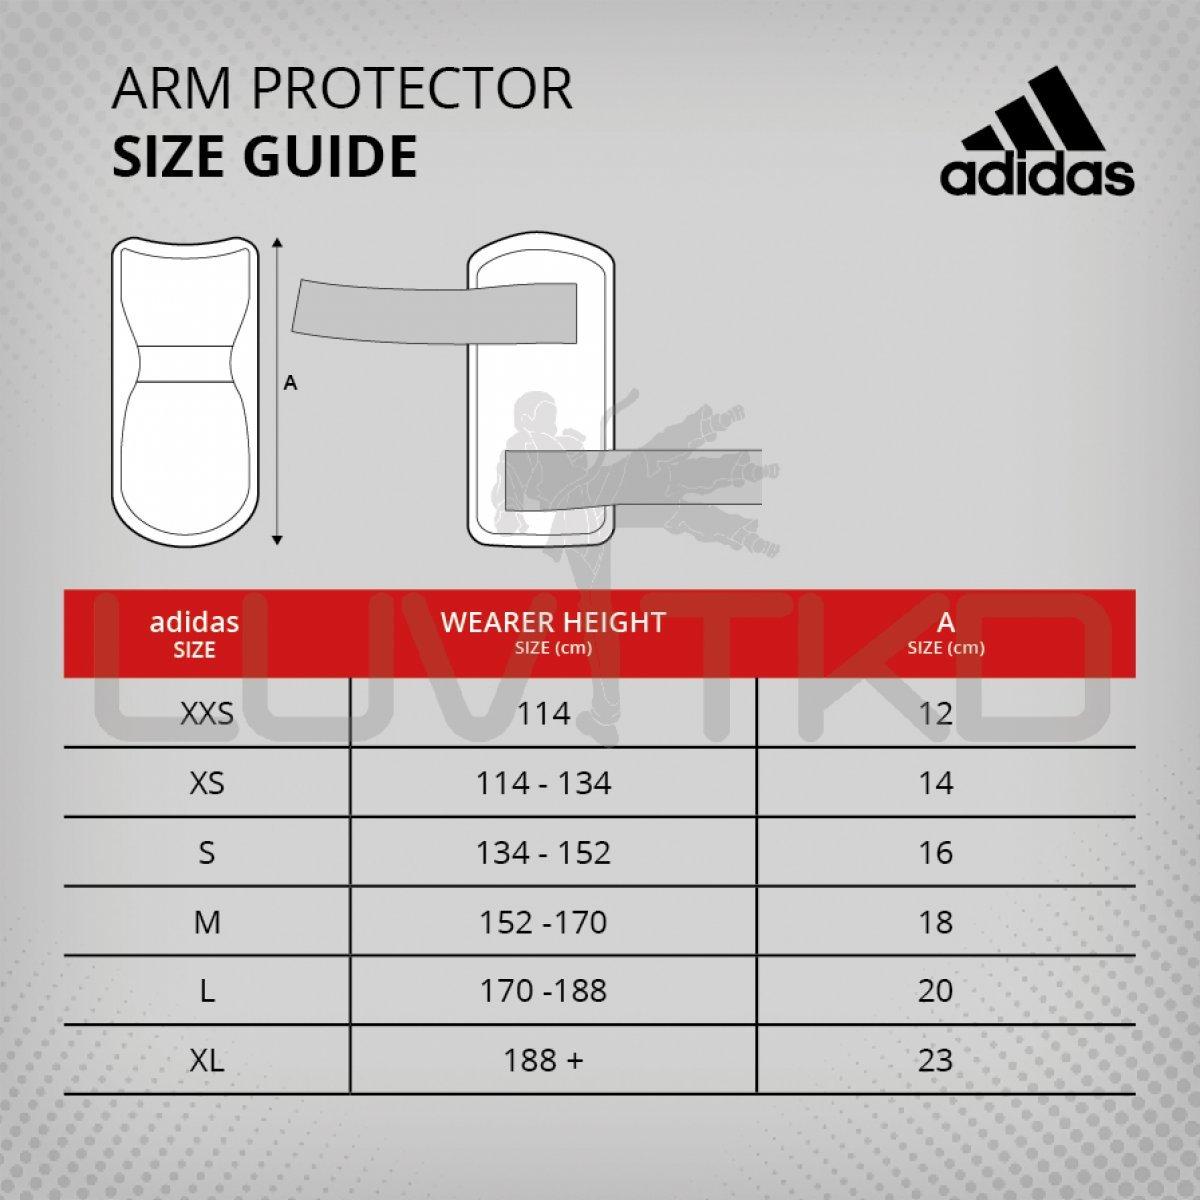 Adidas clothing size chart cm anlis